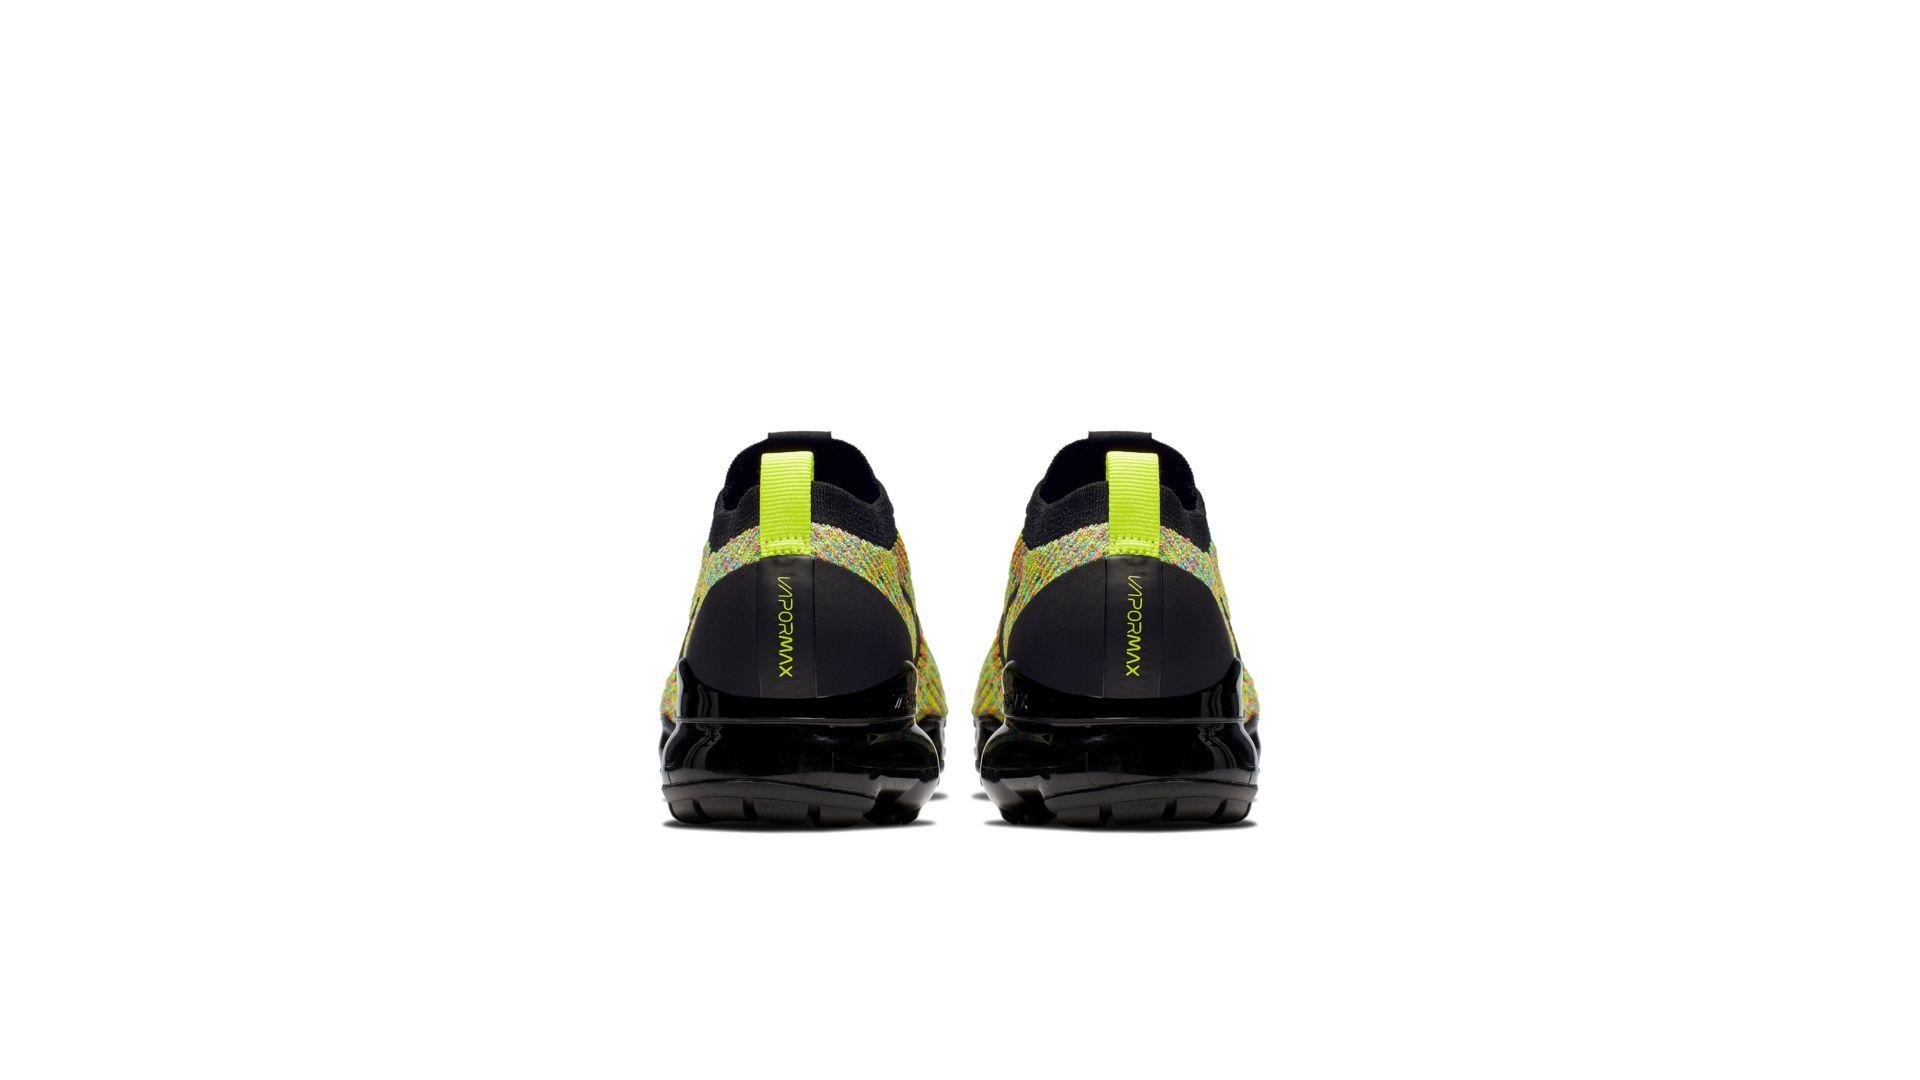 Nike Air Vapormax FK 3 'Black Volt' (AJ6910-004)